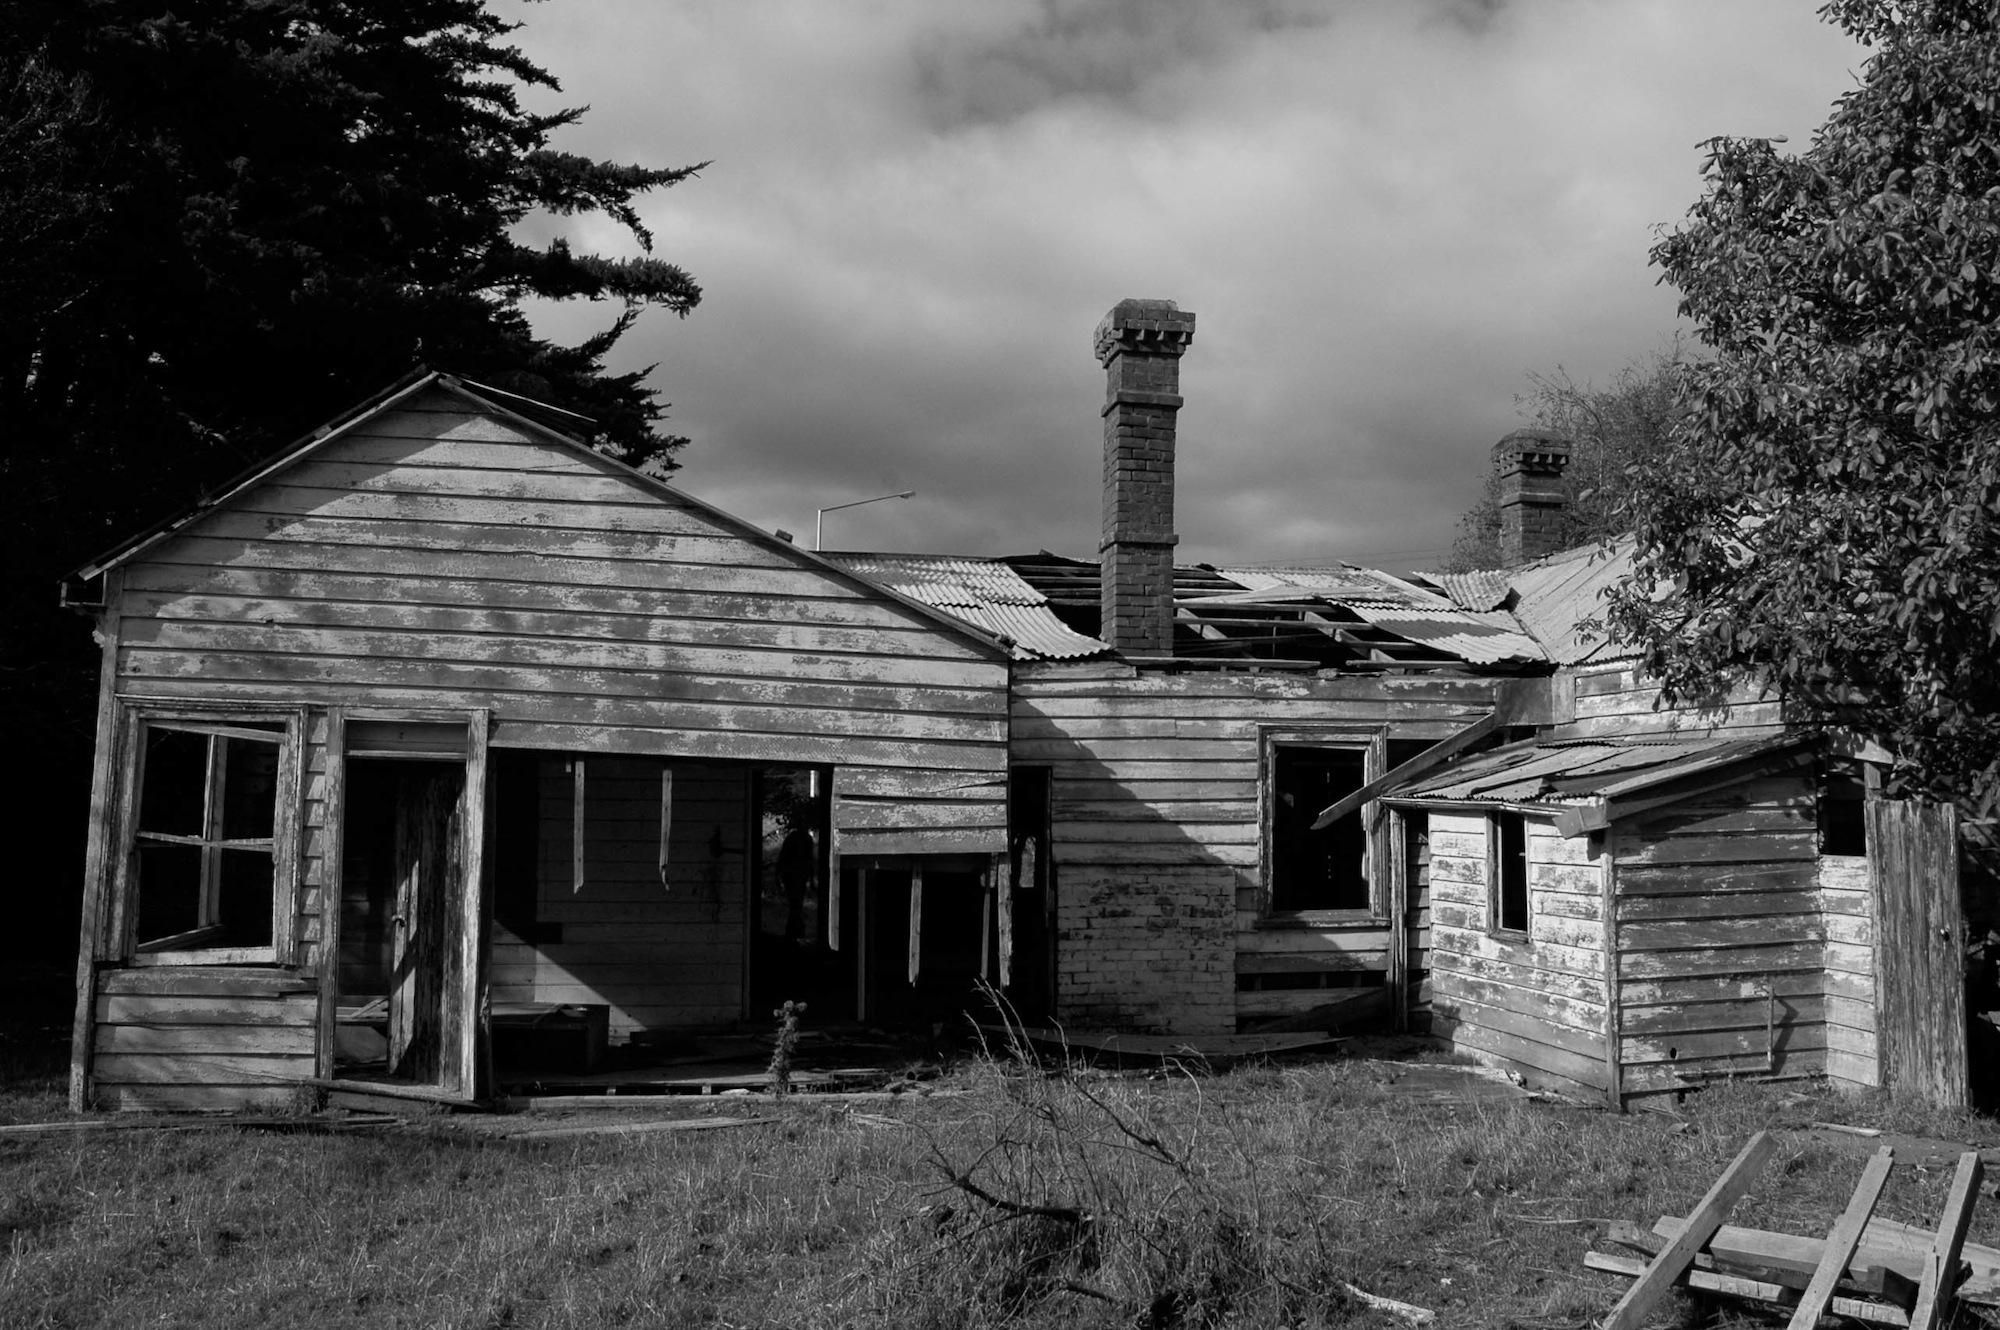 abandoned_house_new zealand_ben_howe_5.jpg